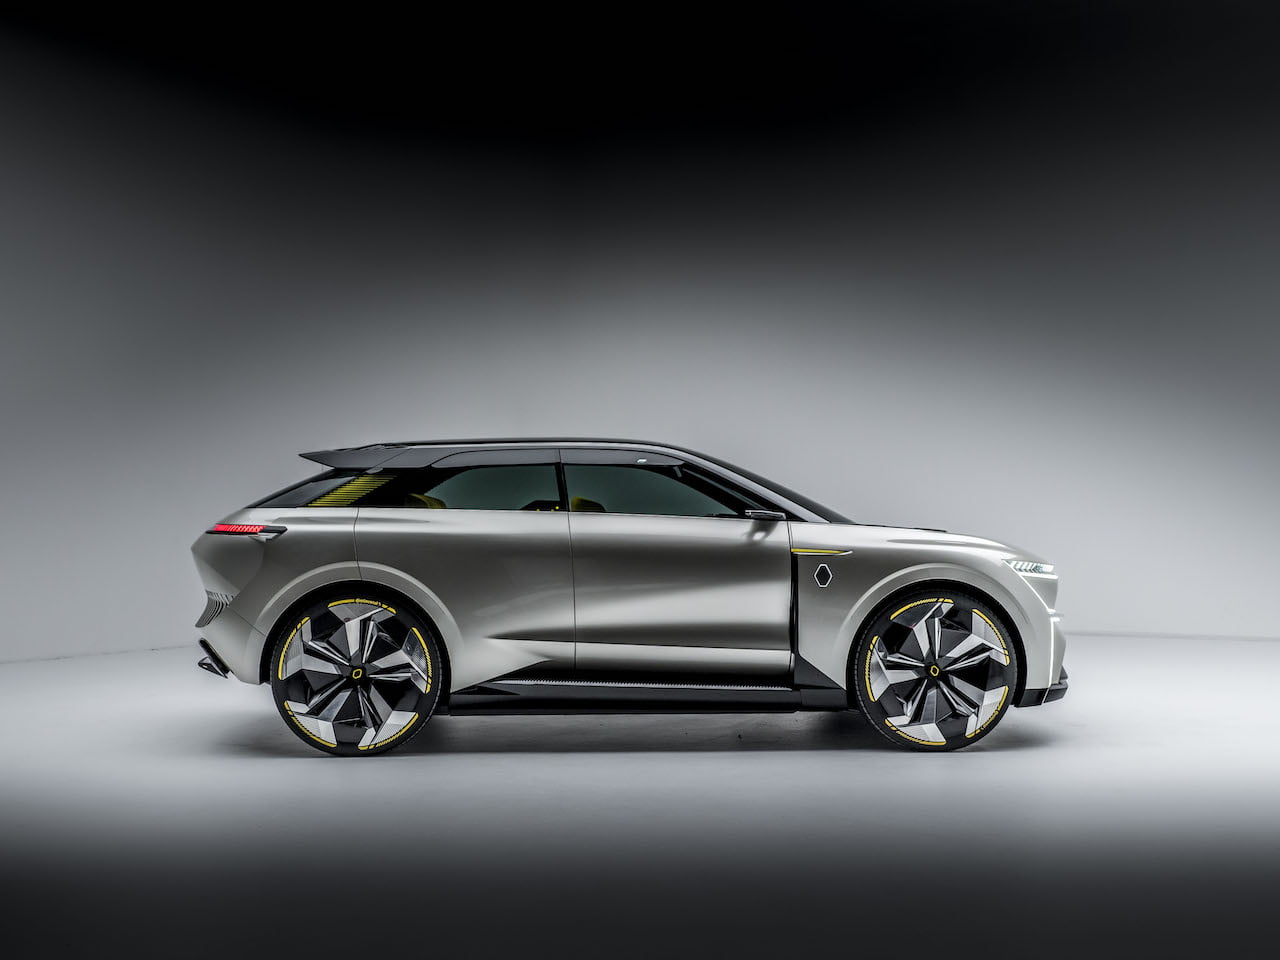 2020 Renault Morphoz concept profile side